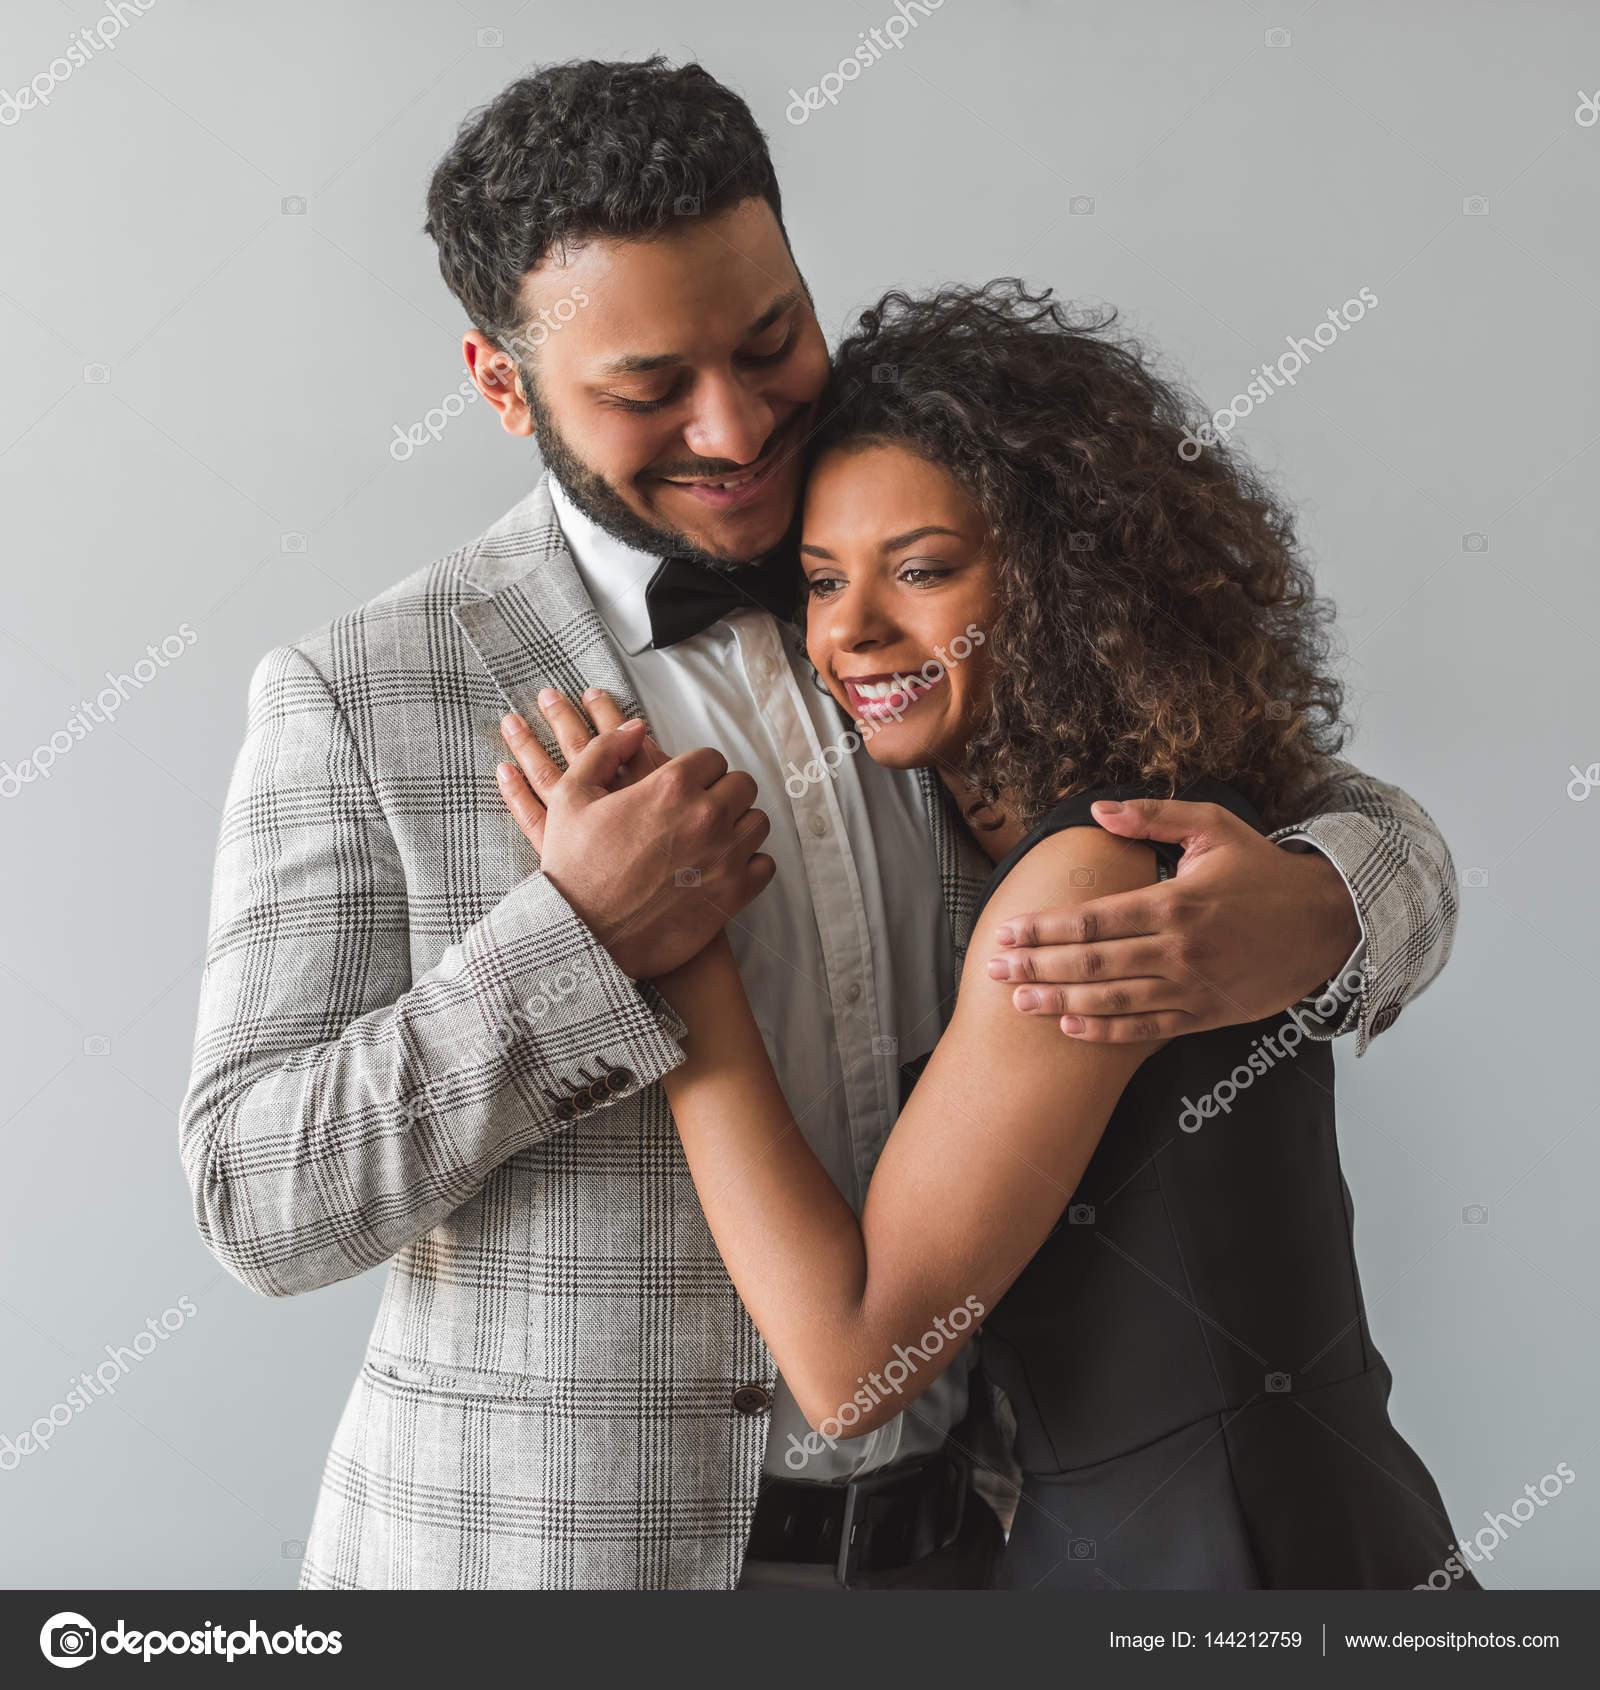 Kostenloses SГјdtrikot Dating